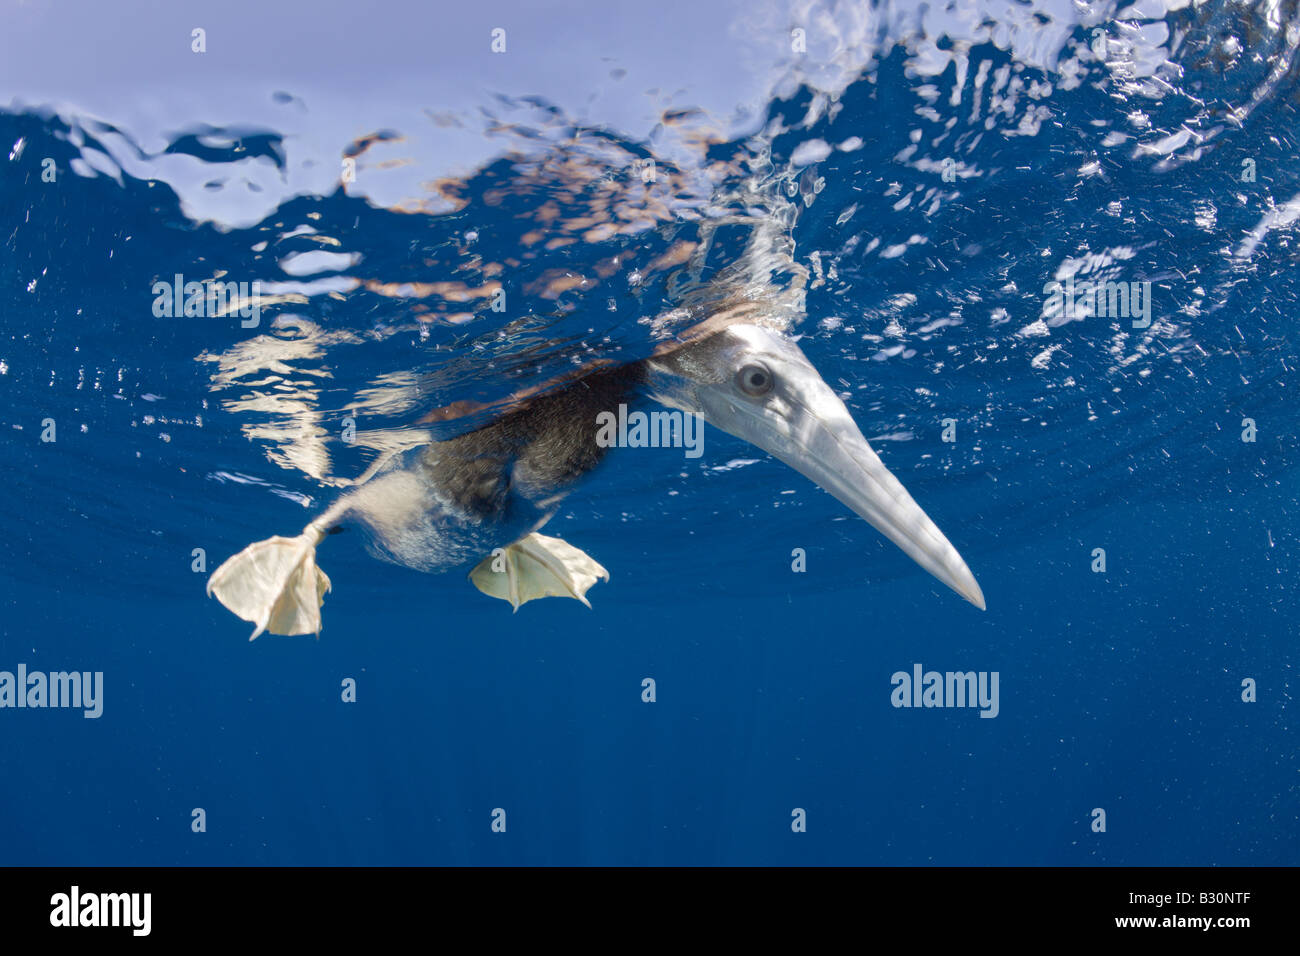 Young Brown Booby Sula leucogaster Marshall Islands Bikini Atoll Micronesia Pacific Ocean - Stock Image